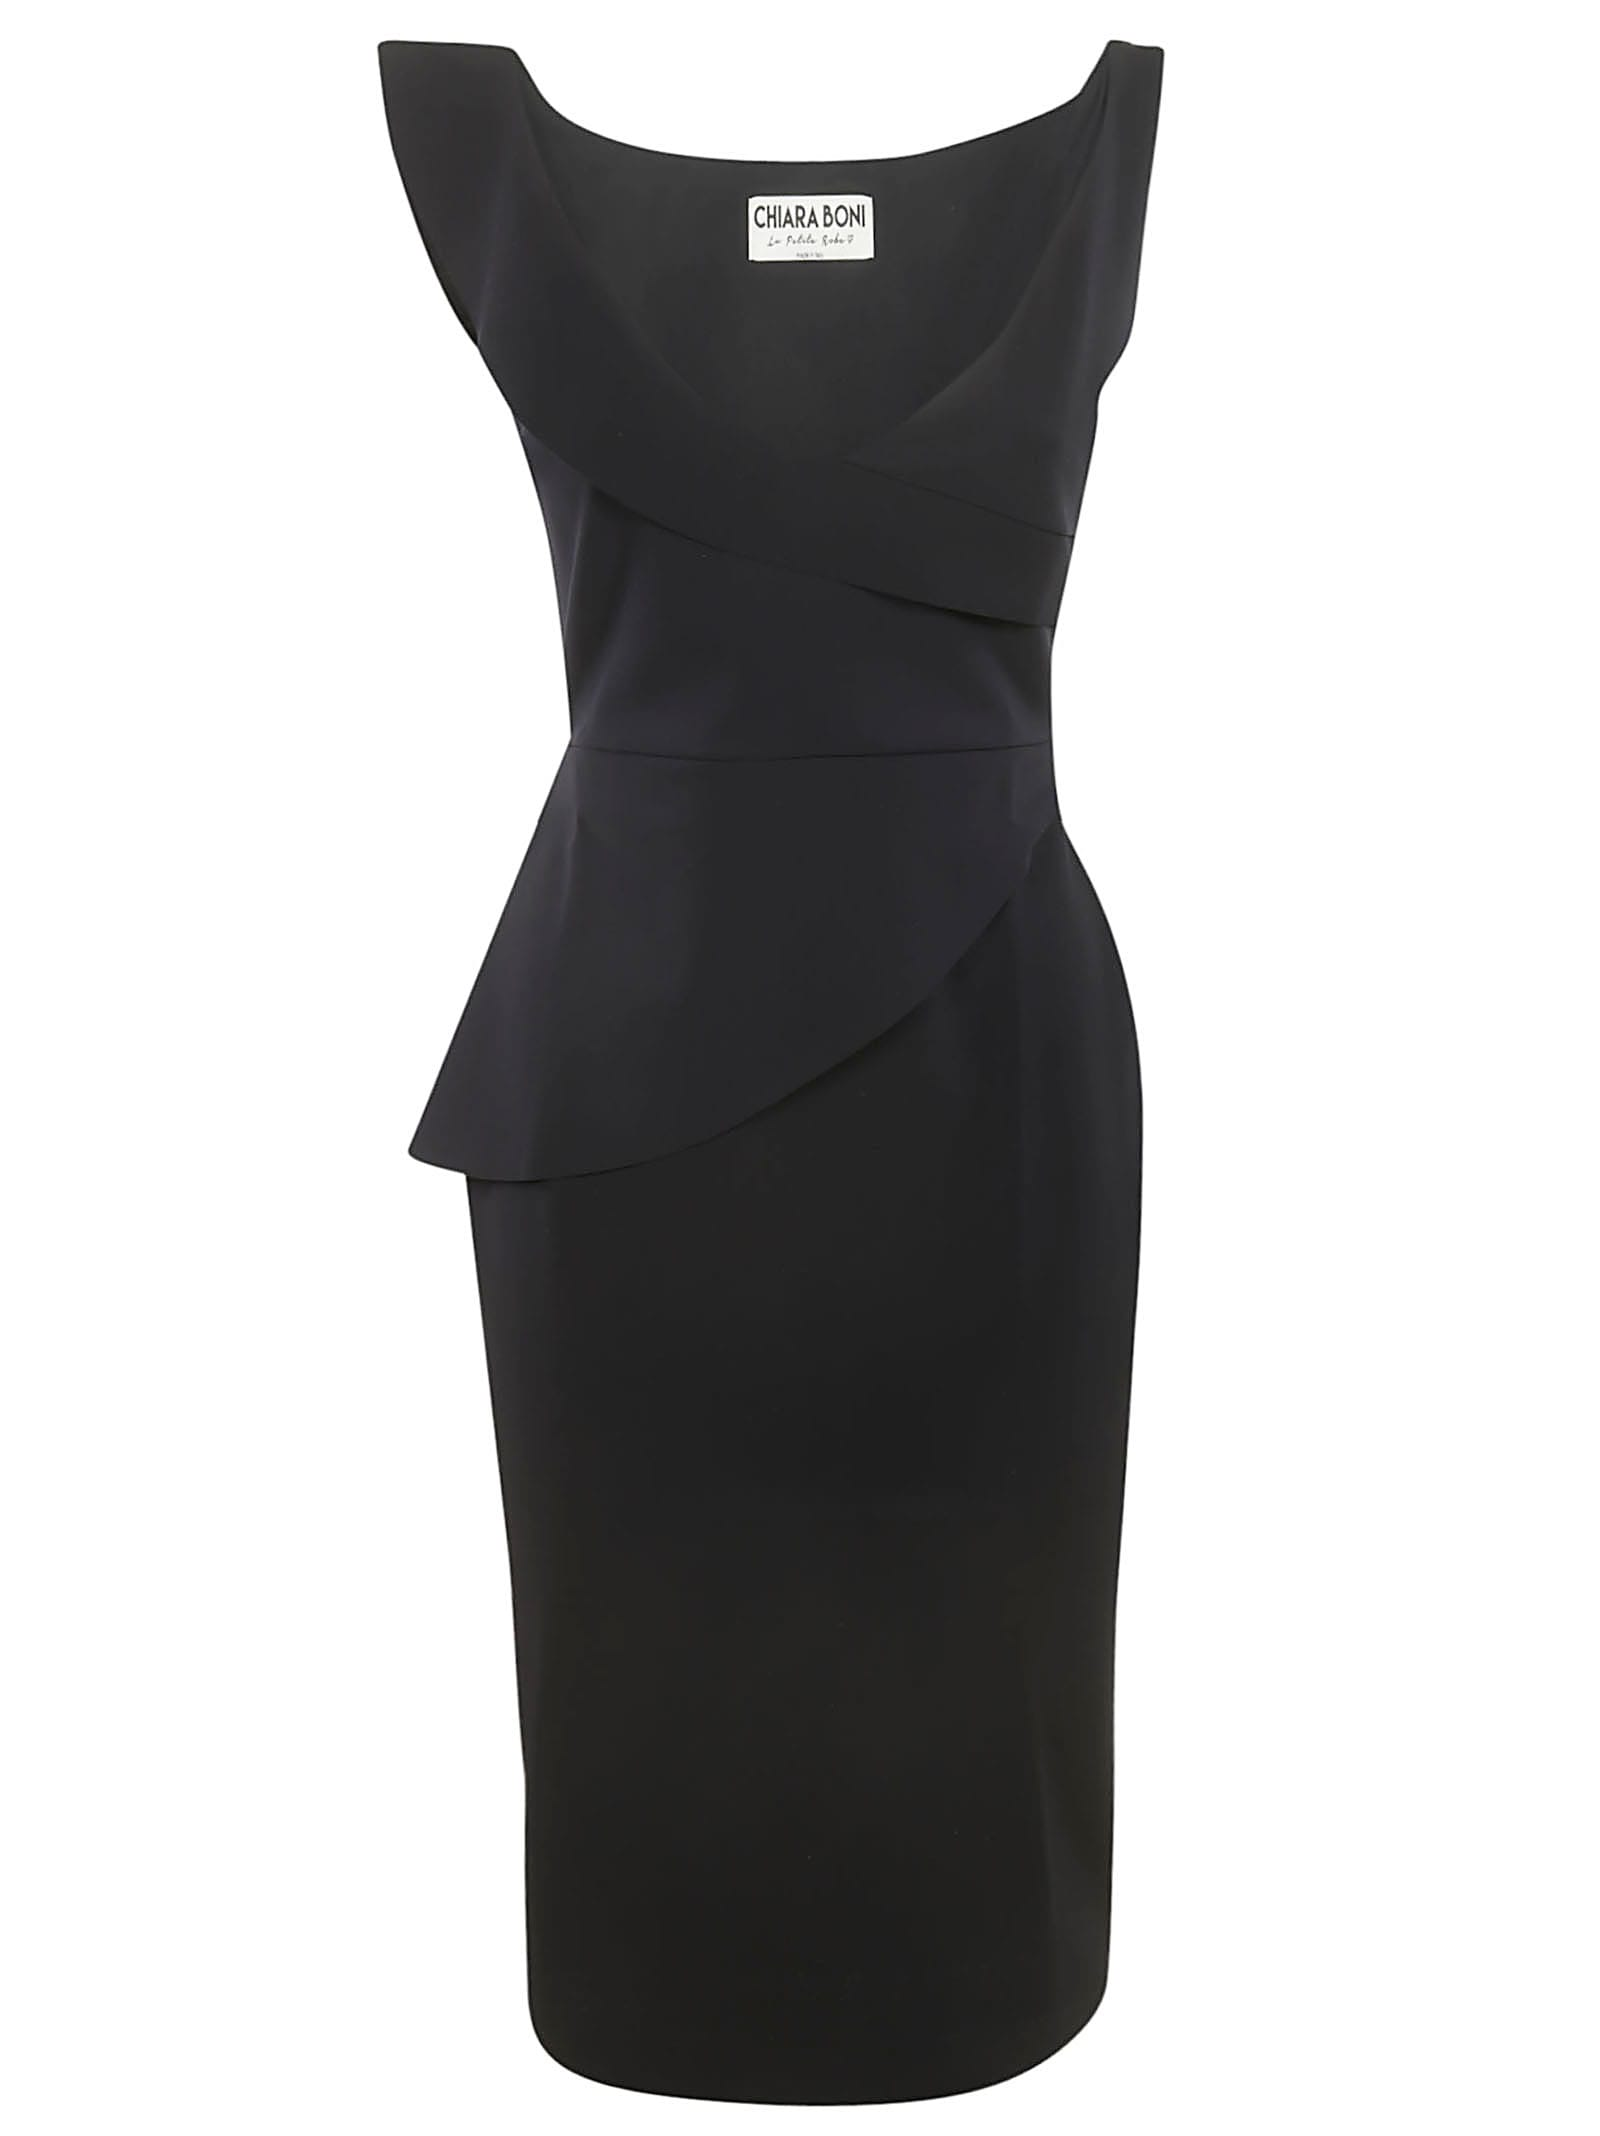 Buy La Petit Robe Di Chiara Boni Sleeveless V-neck Dress online, shop La Petit Robe Di Chiara Boni with free shipping